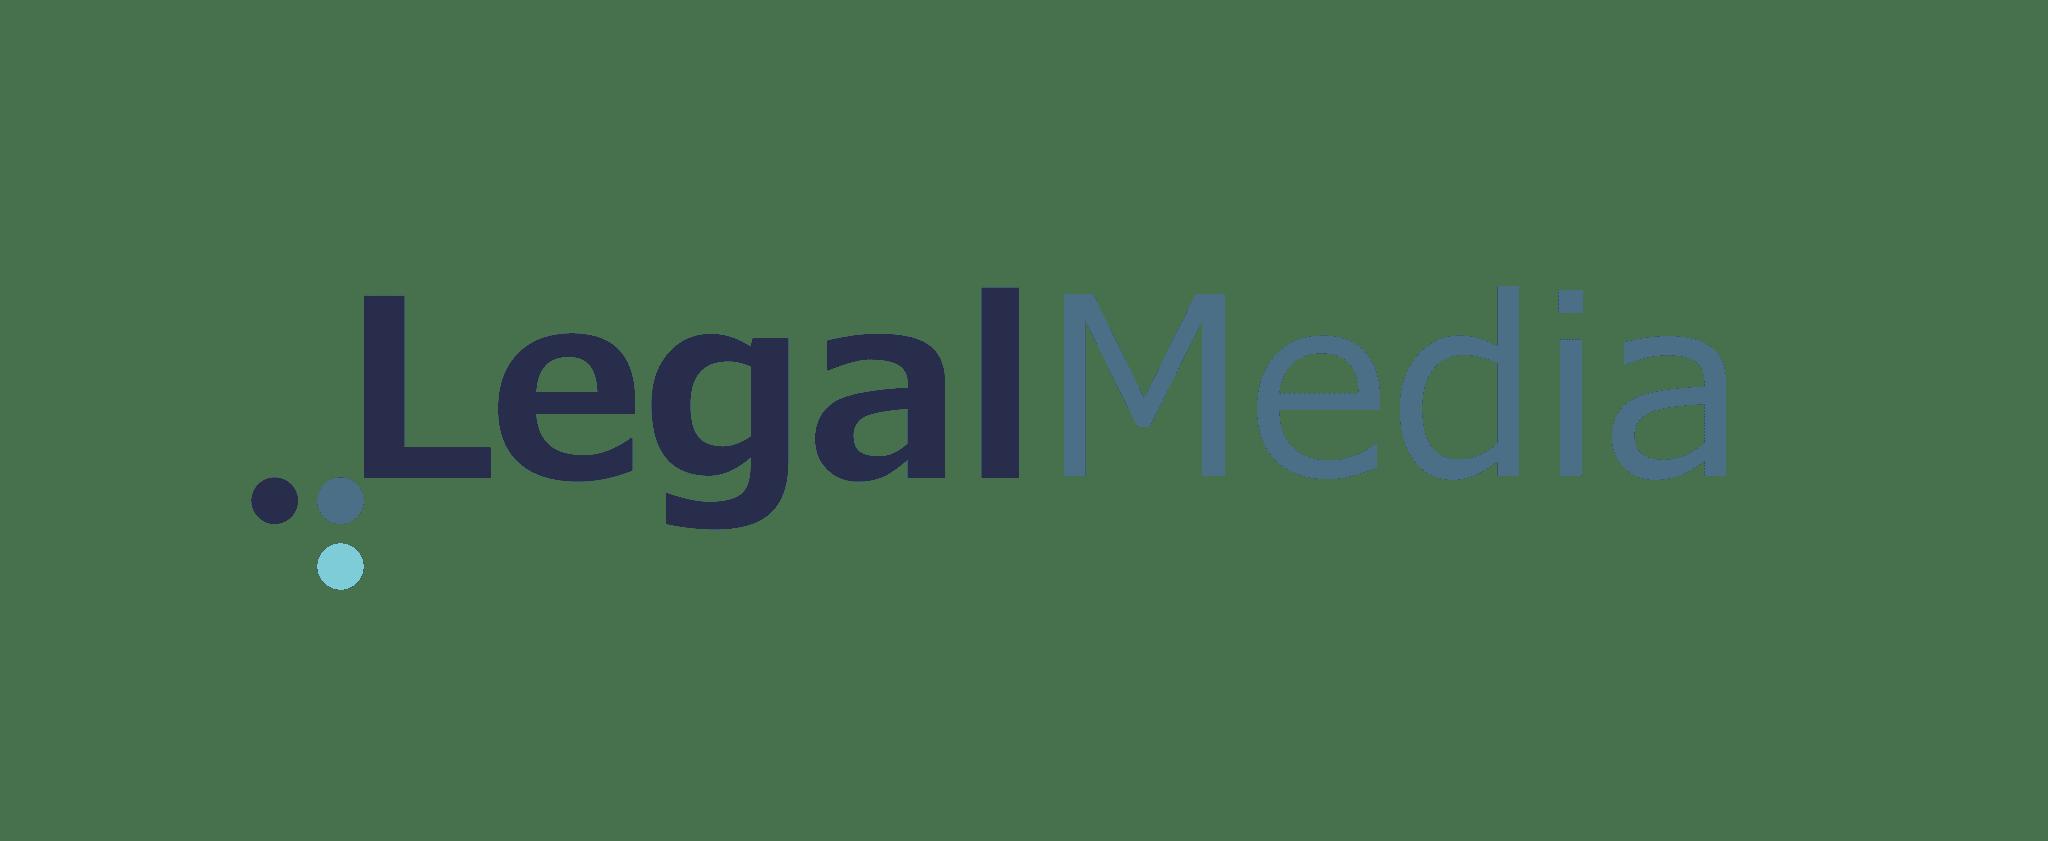 Legal Media